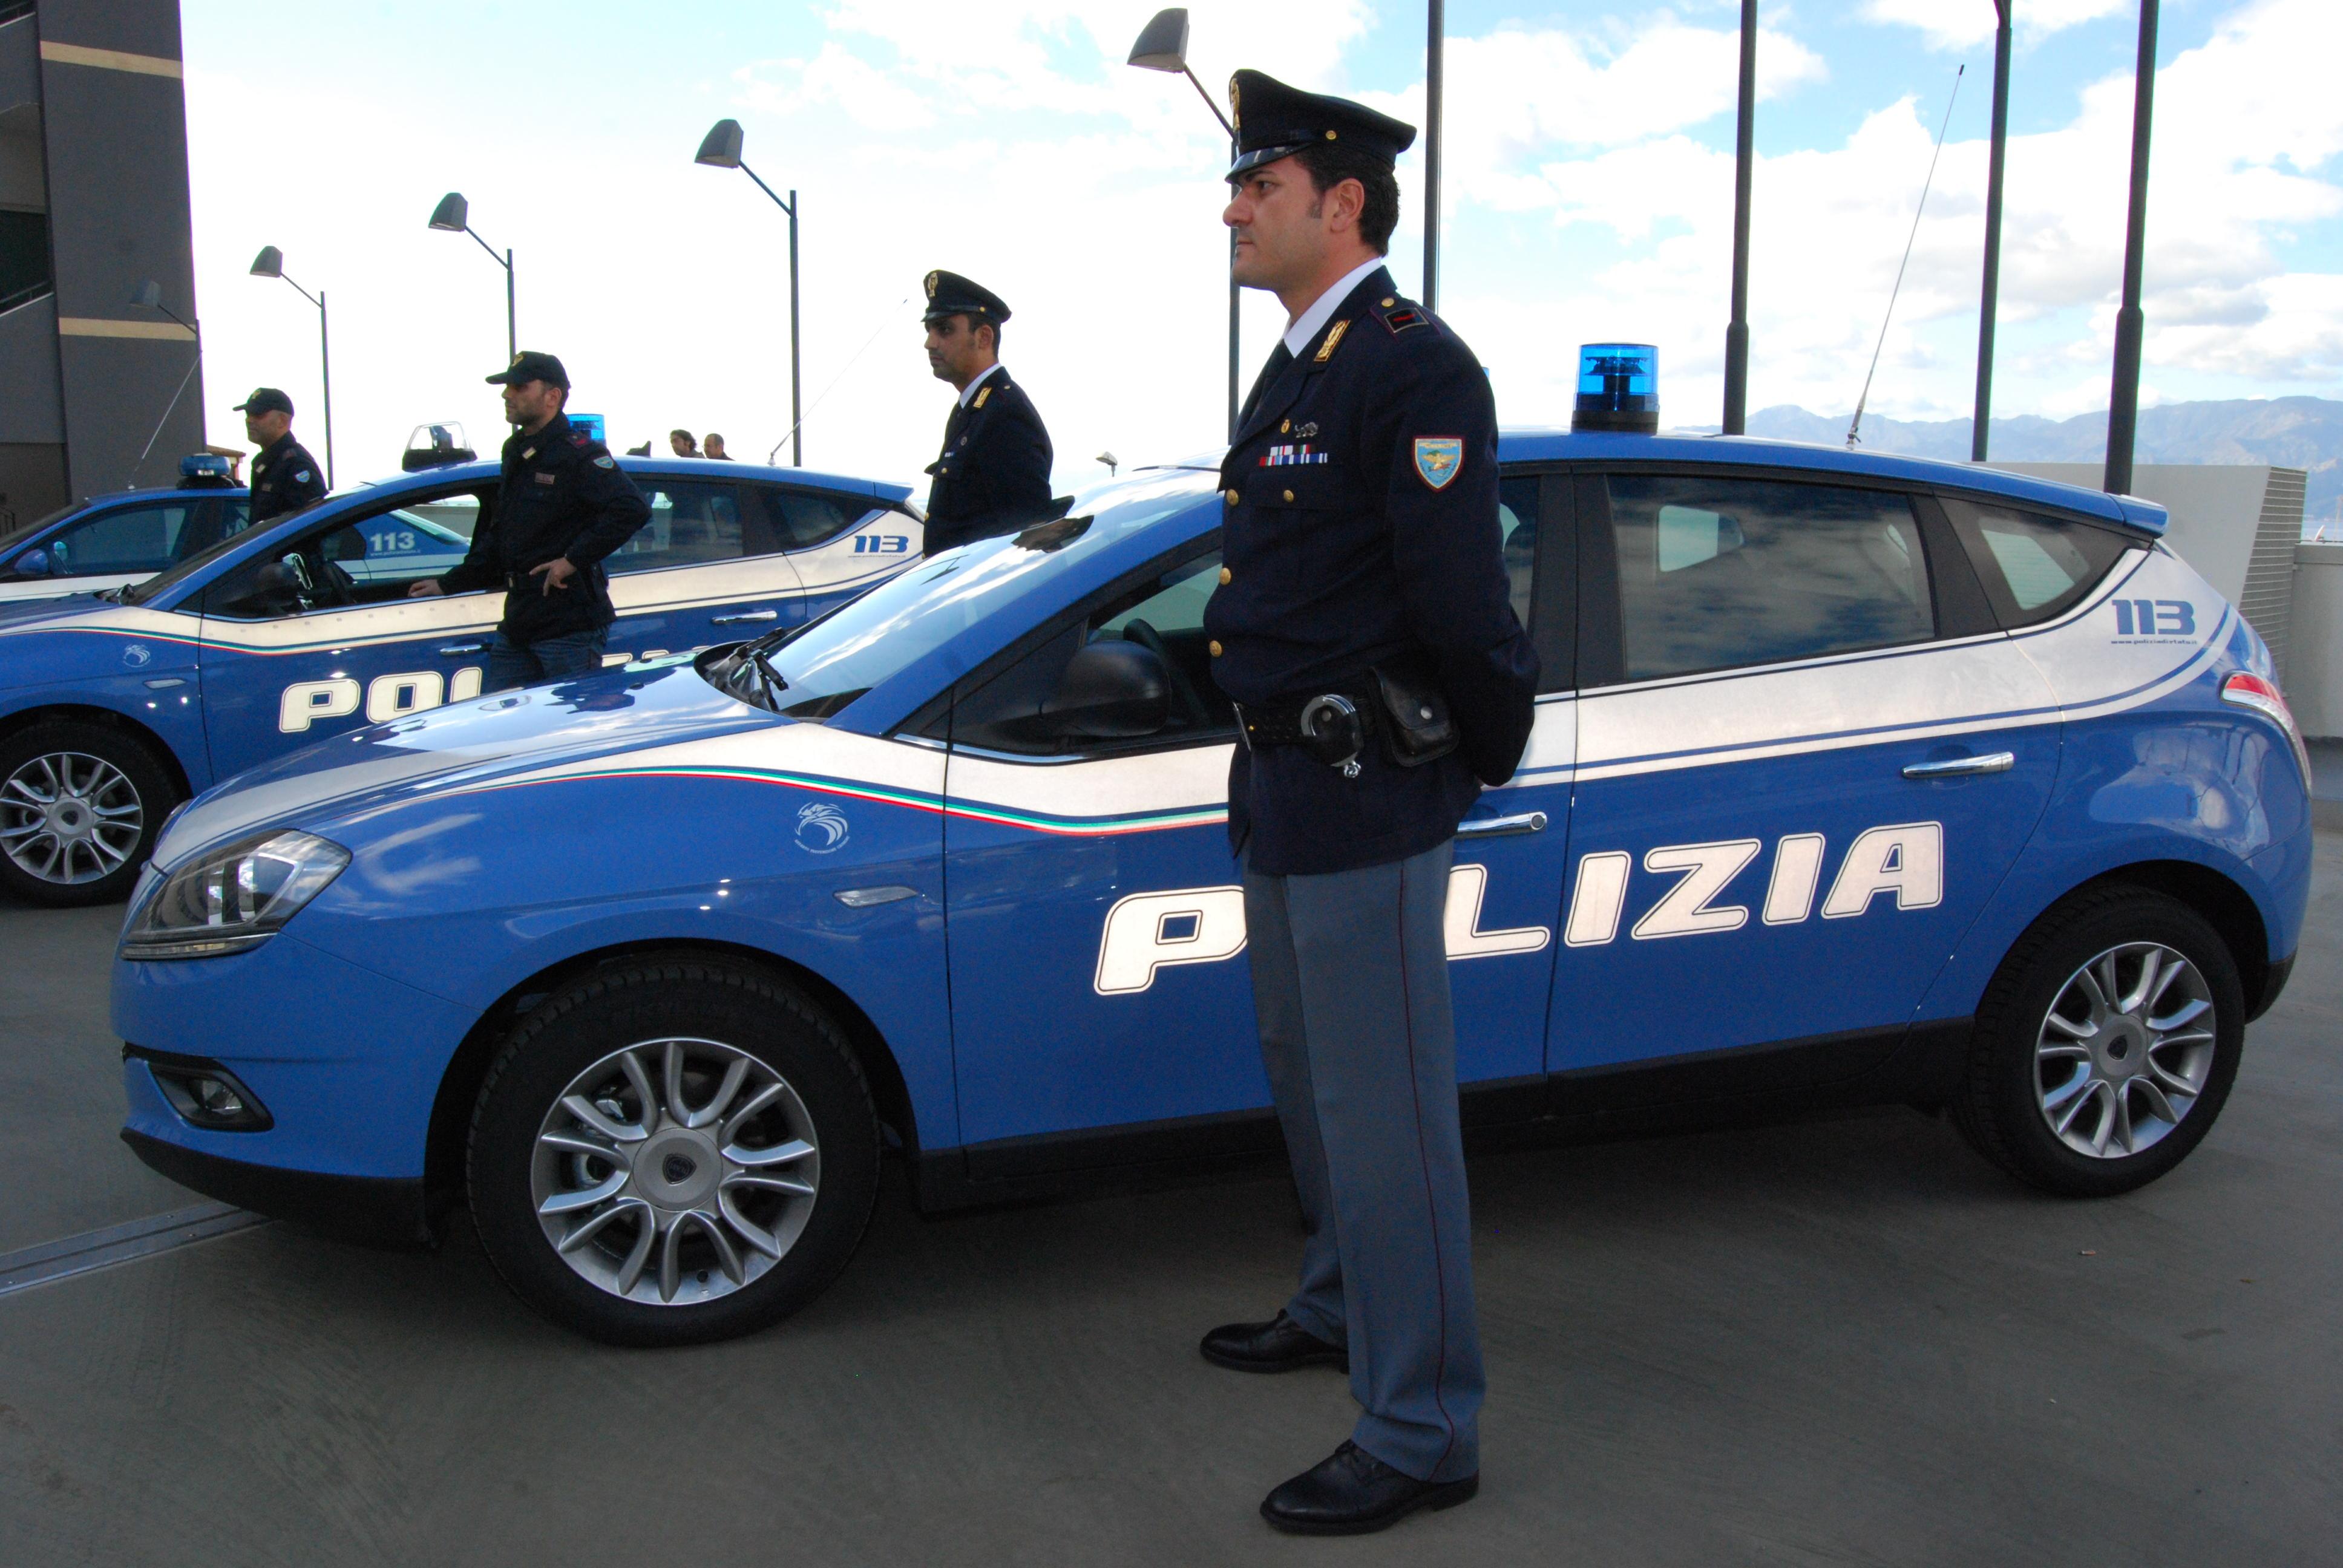 Sicurezza bis: Gregorio Fontana (FI), a quando decreto Sicurezza ter?